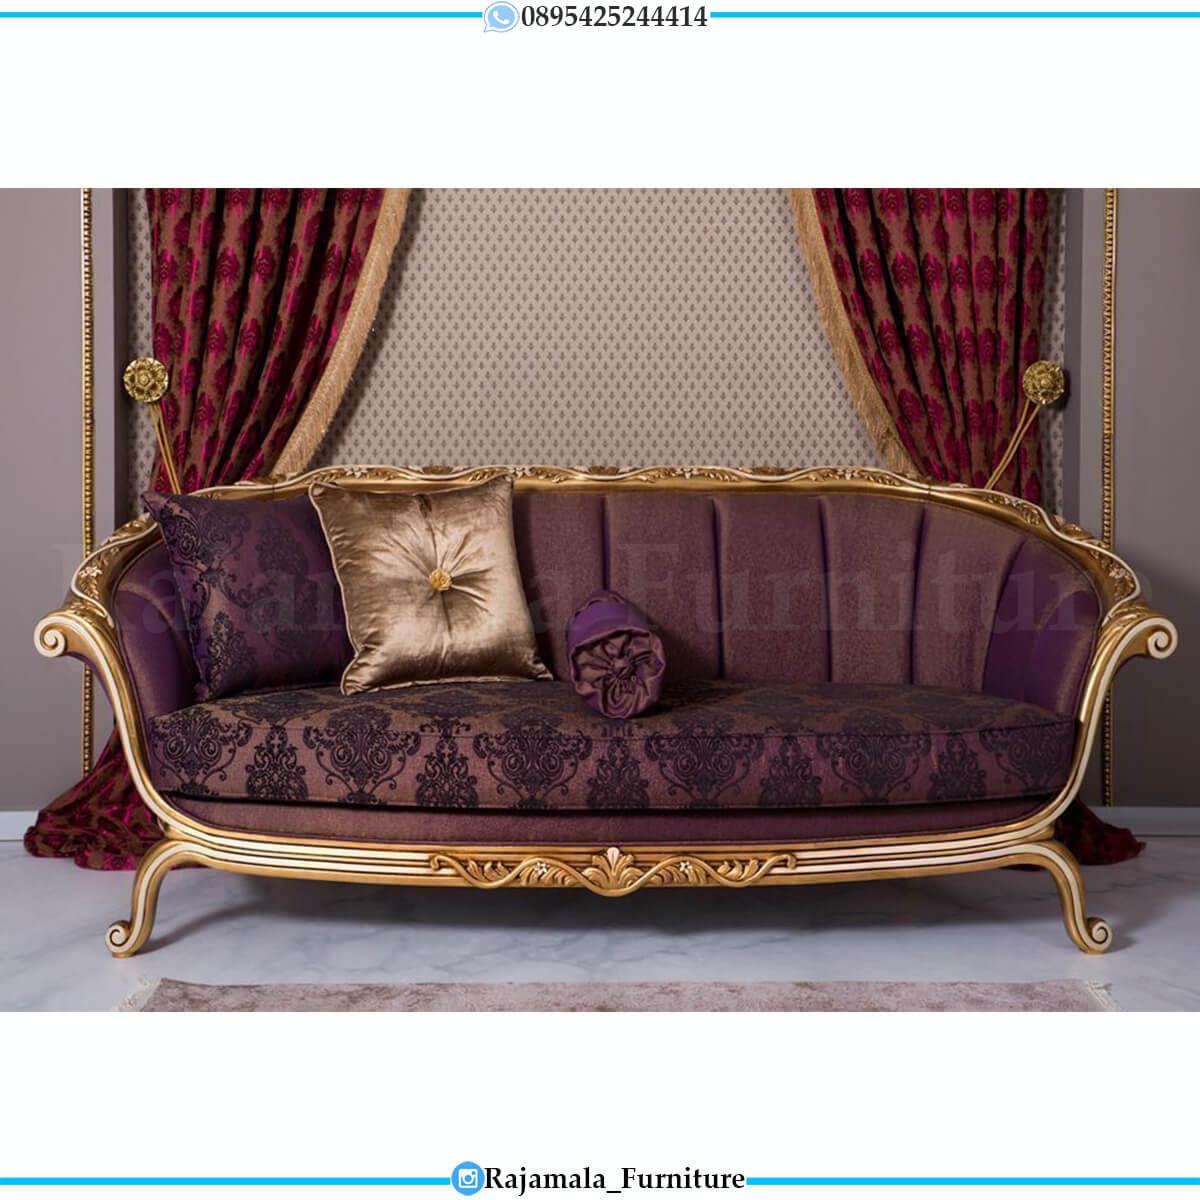 Set Sofa Tamu Mewah Jepara Ukiran Luxury Baroque Italian Design RM-0736